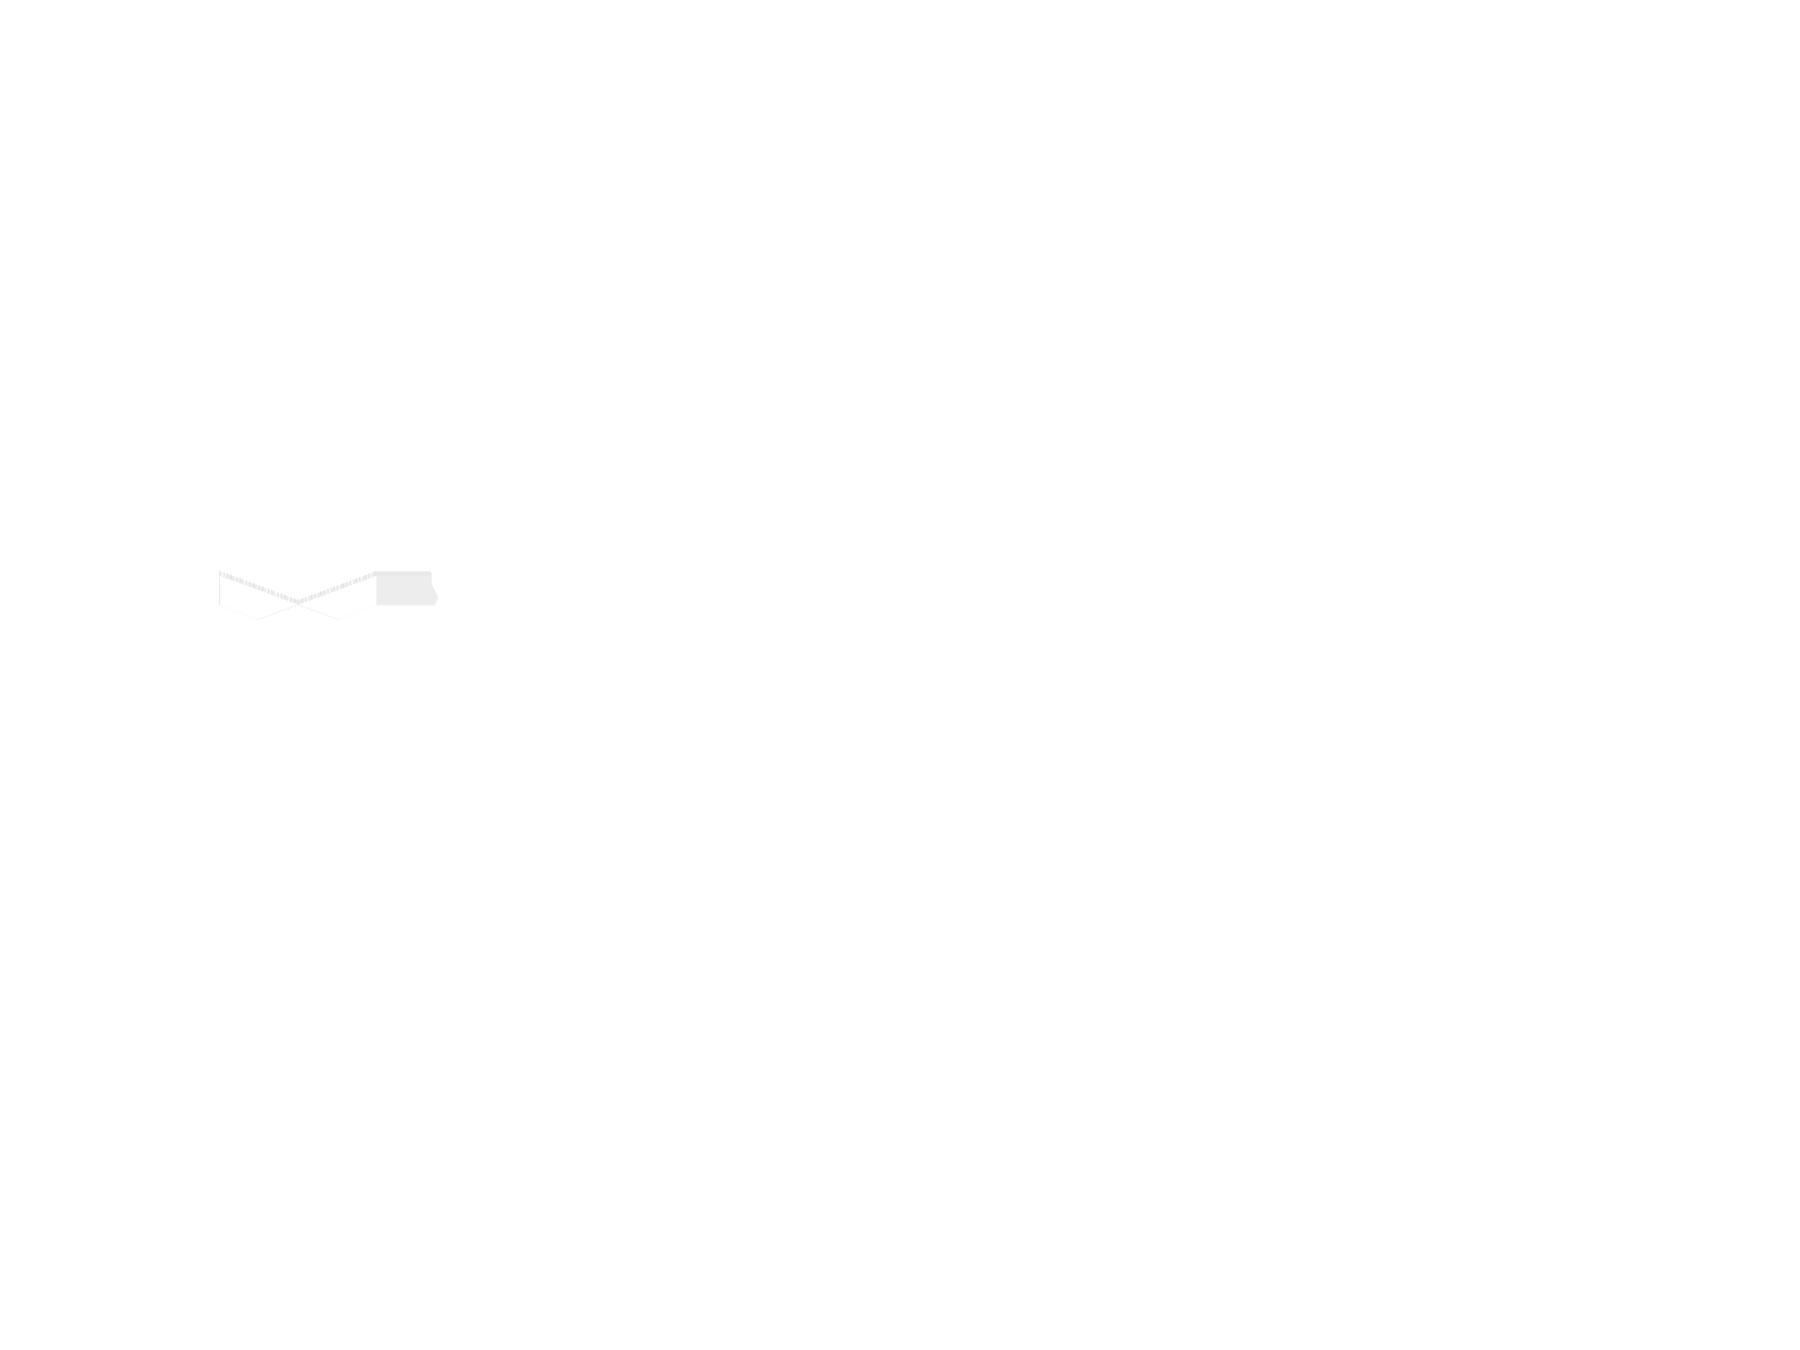 Patentanwälte Vollmann Hemmer Lindfeld